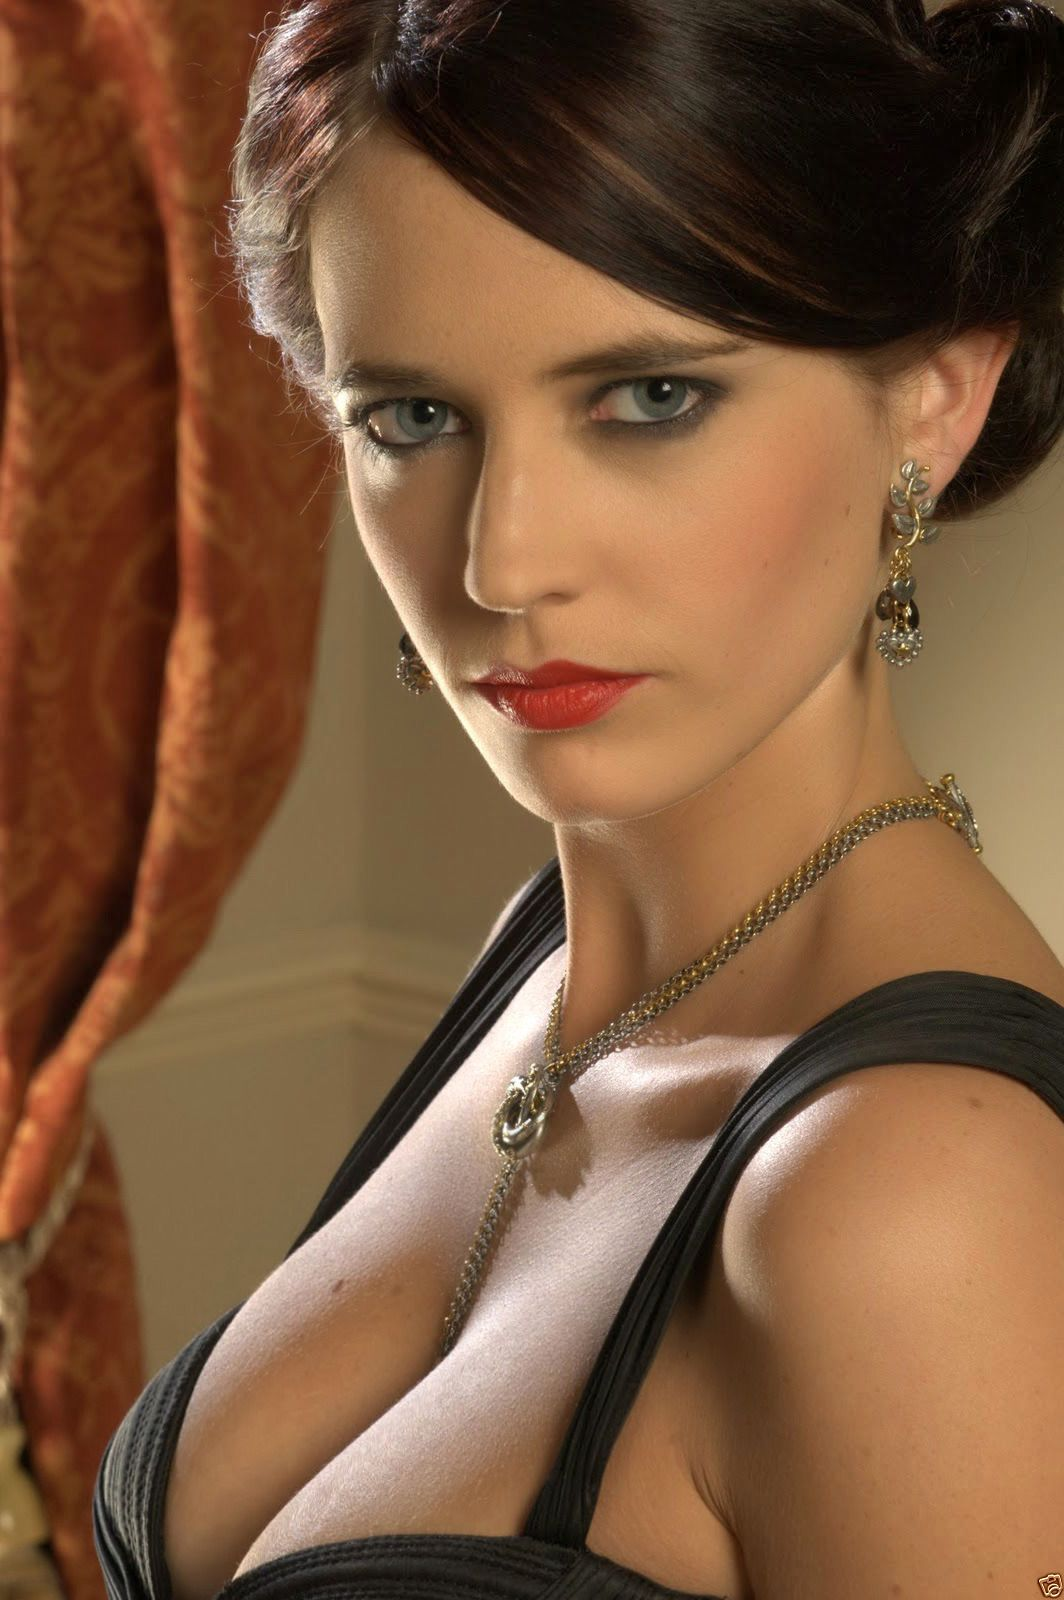 Pin by rolf neumann on 007 | Eva green, Actress eva green ...